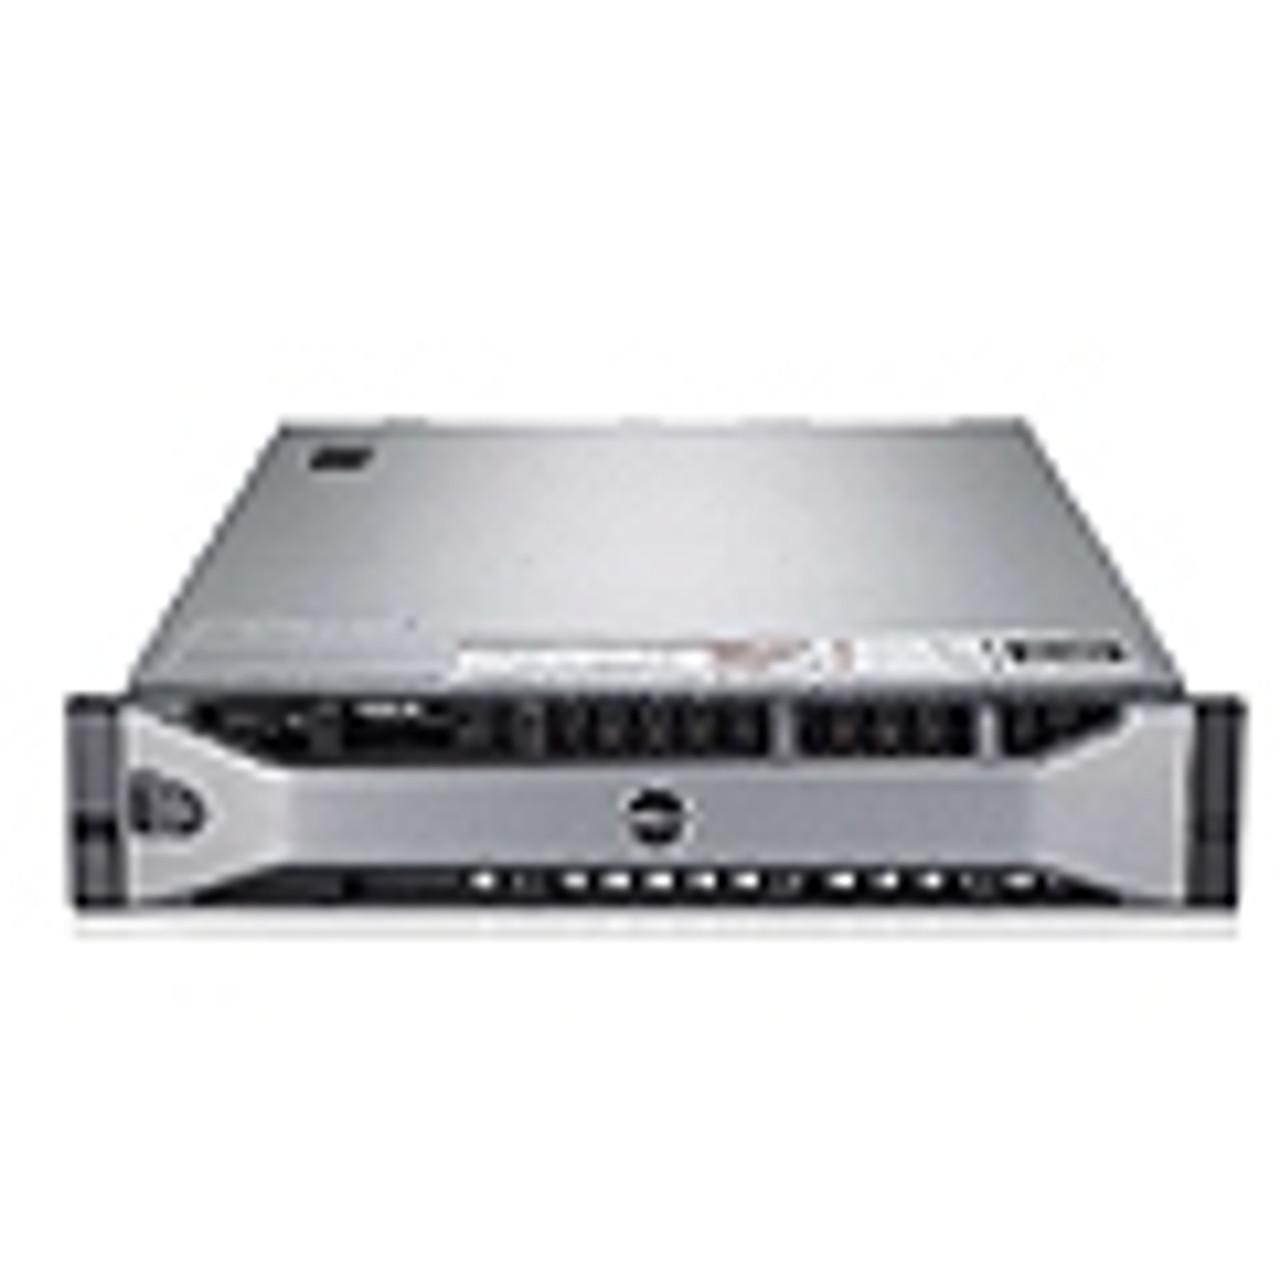 Dell PowerEdge R820 Servers